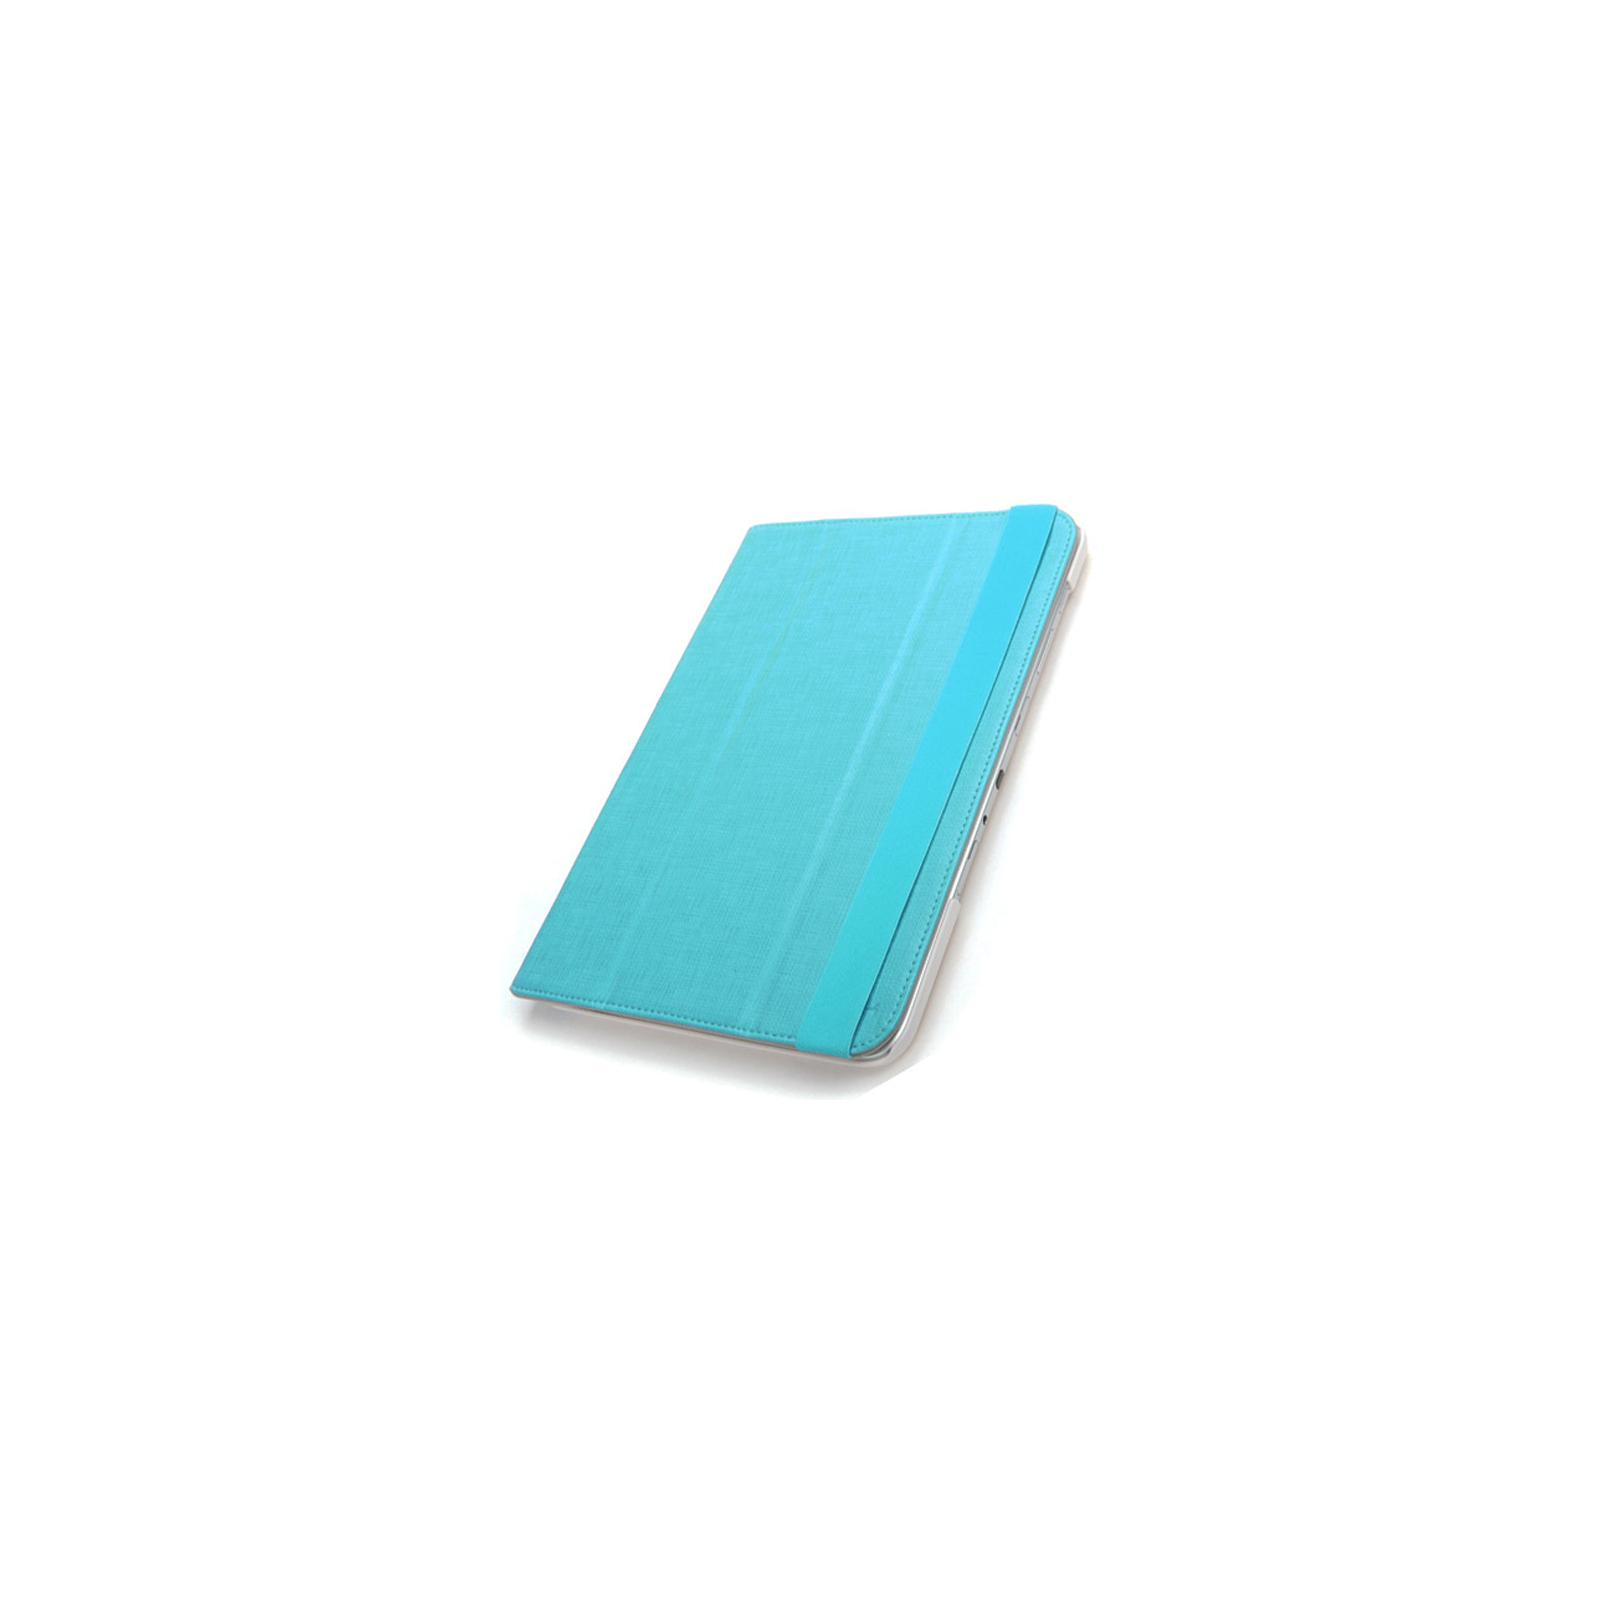 "Чехол для планшета Rock 8"" Rock Samsung Note 8.0 N5100 flexible series green (6950290627965) изображение 2"